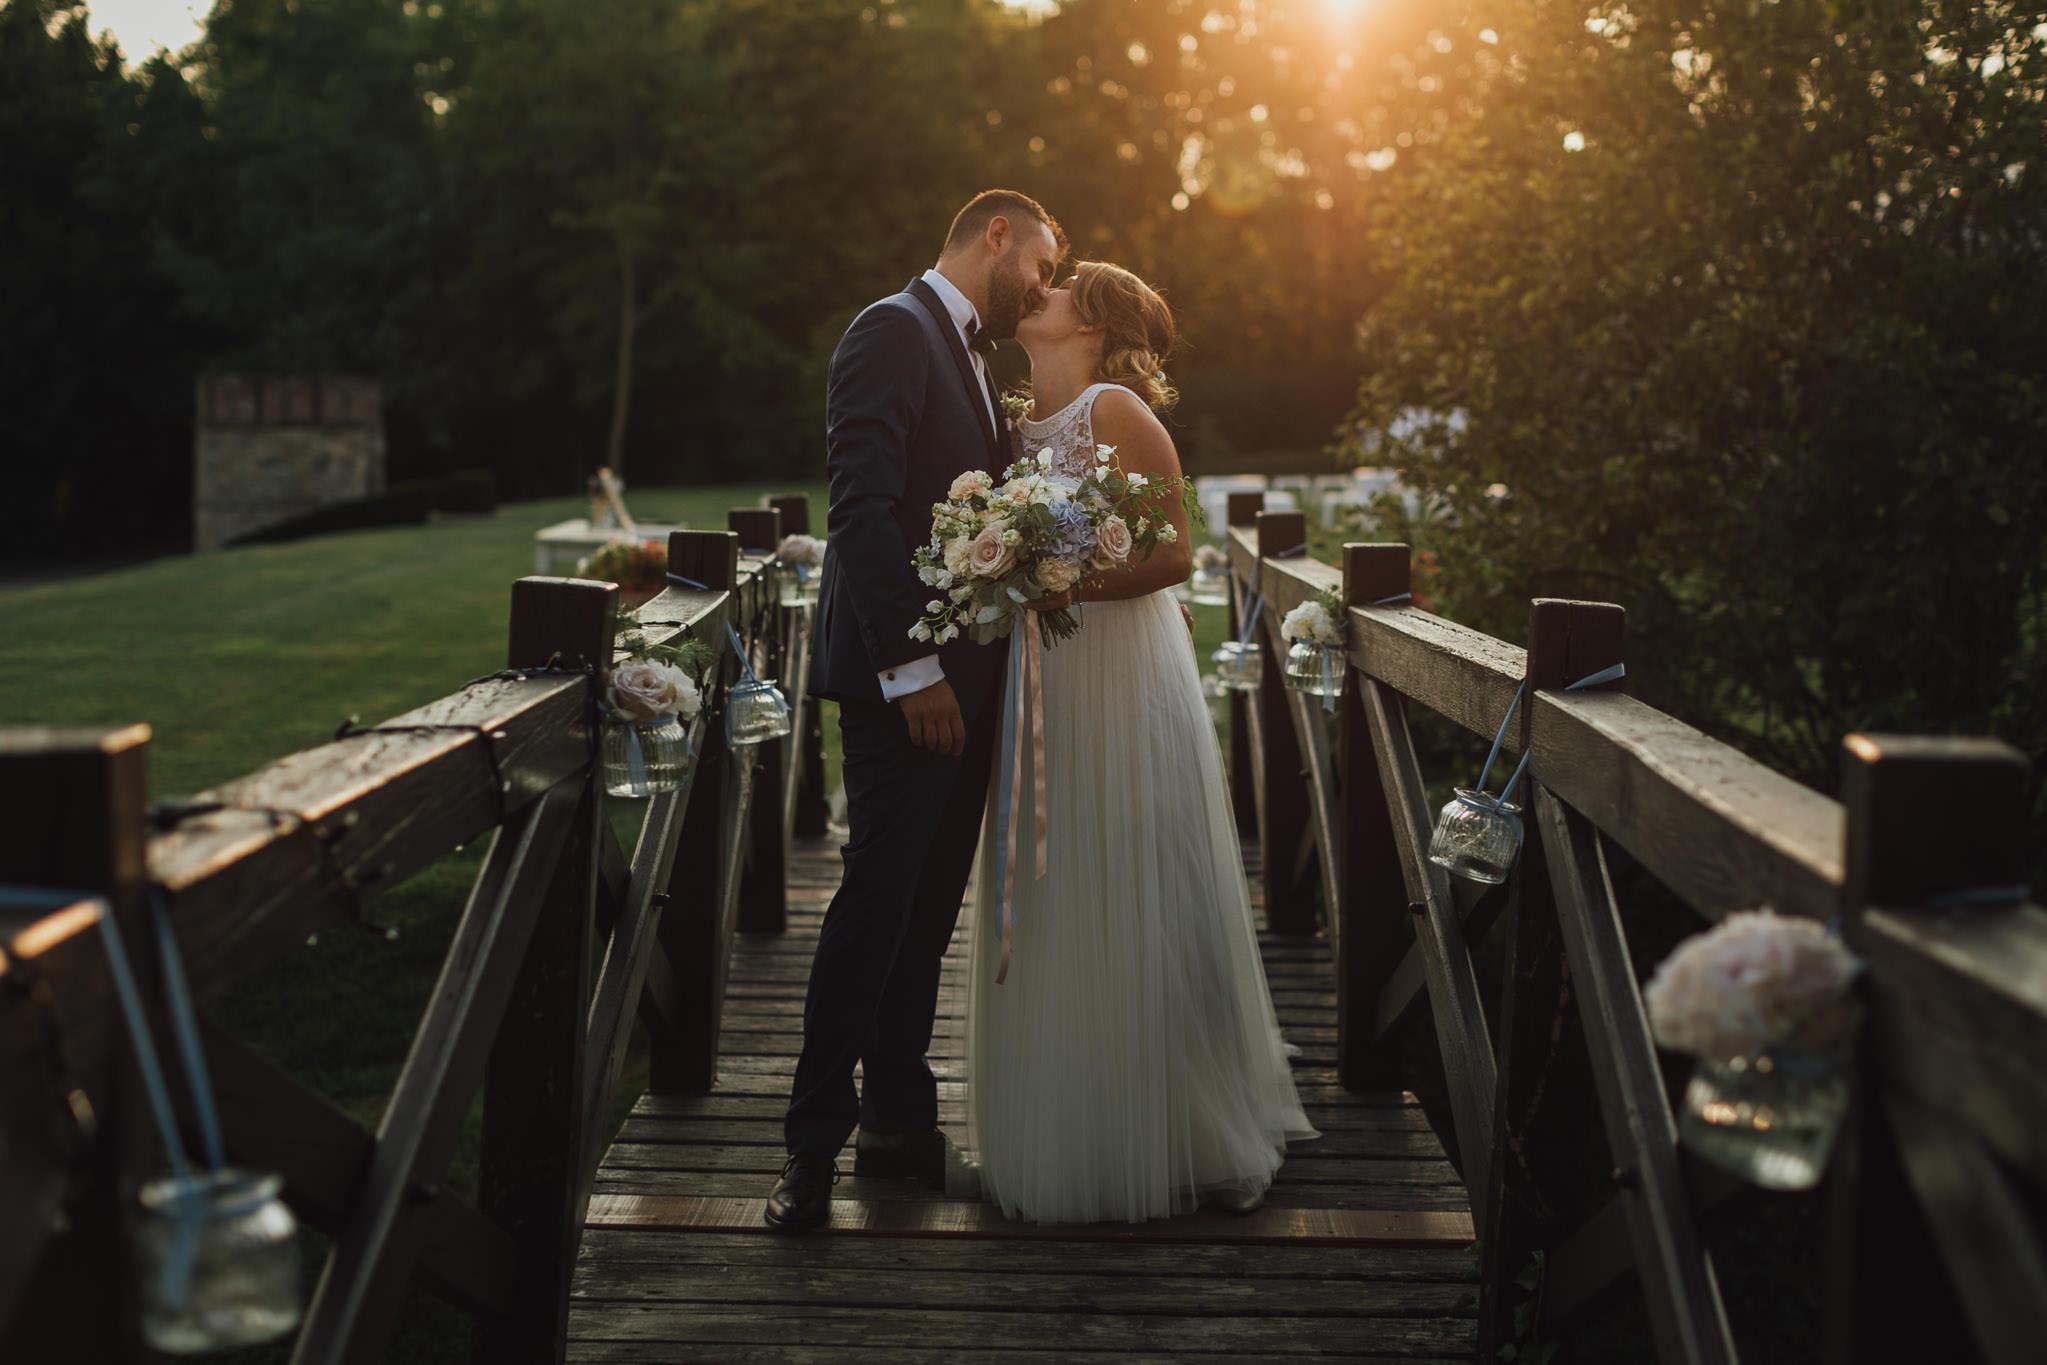 fotografia_di_matrimonio_portfolio-1057